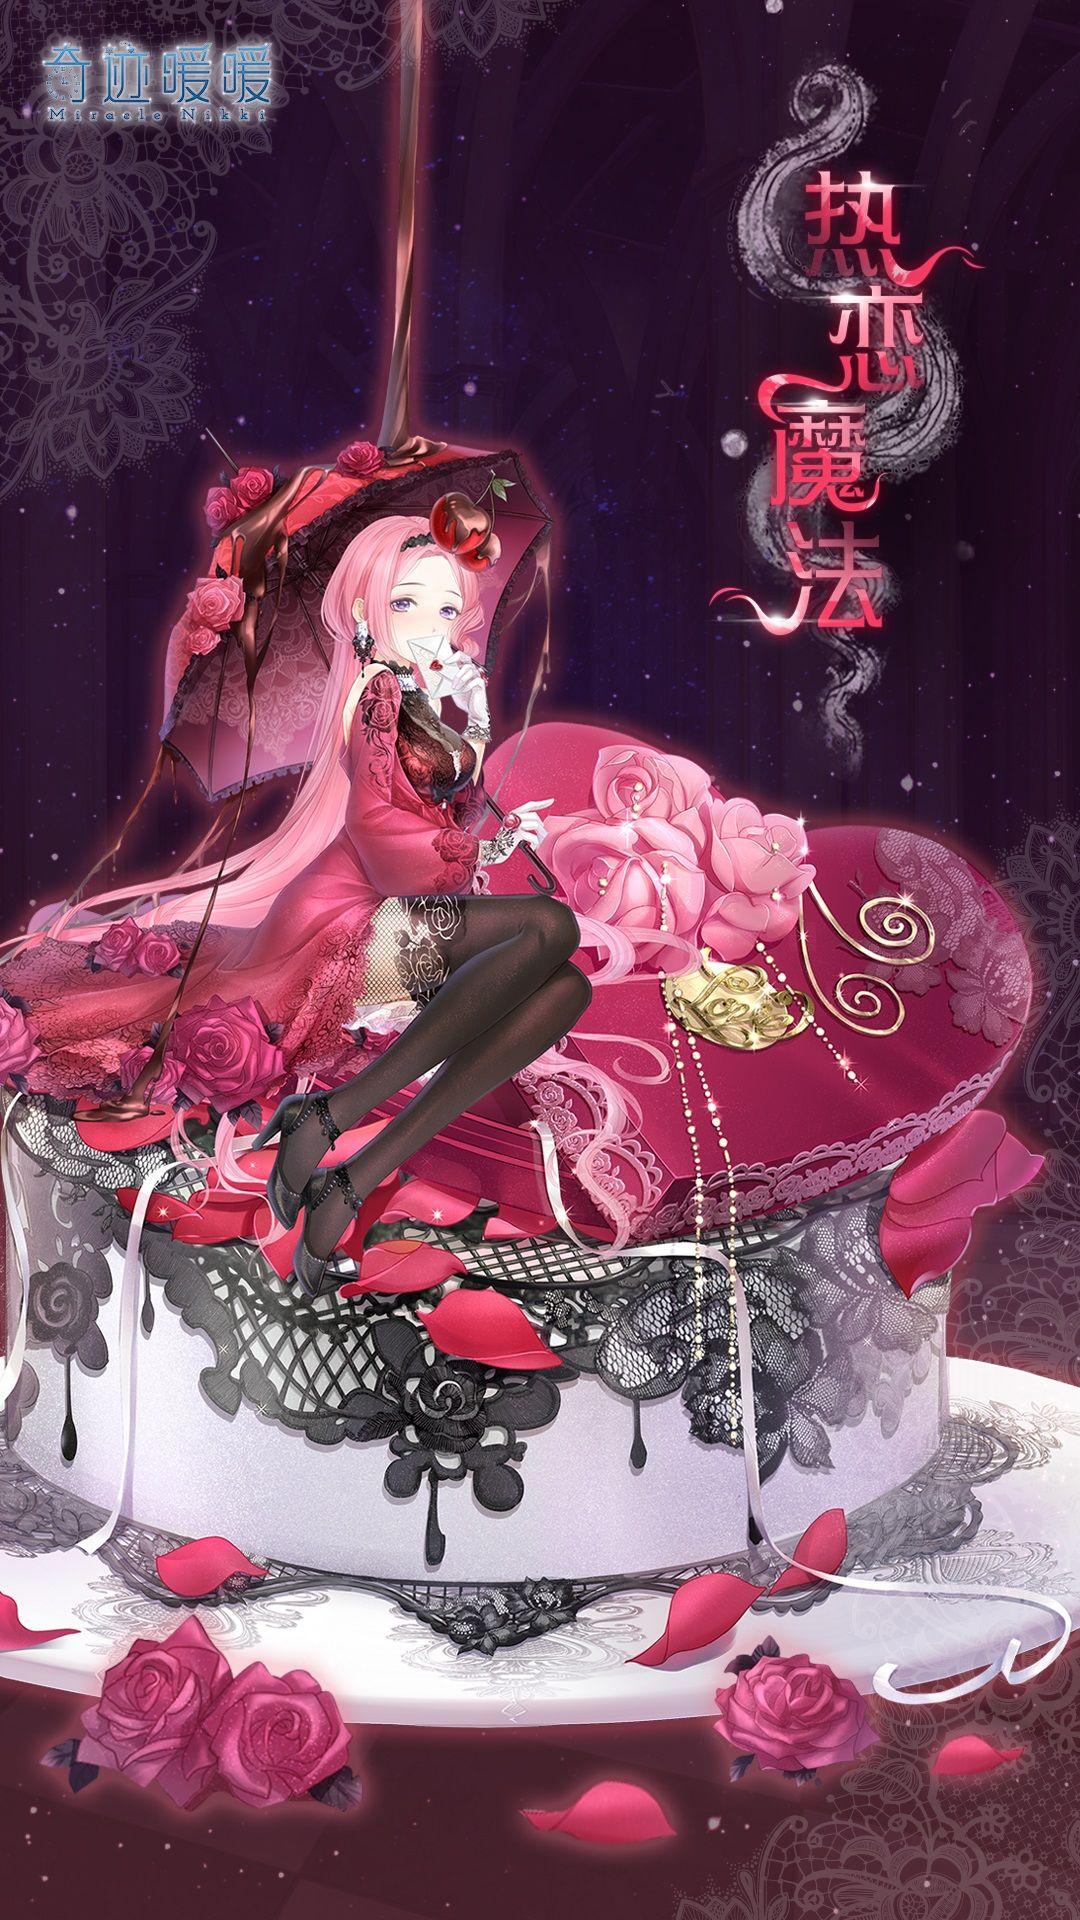 Miracle Nikki Feb 2018 Valentine's Day Style Anime